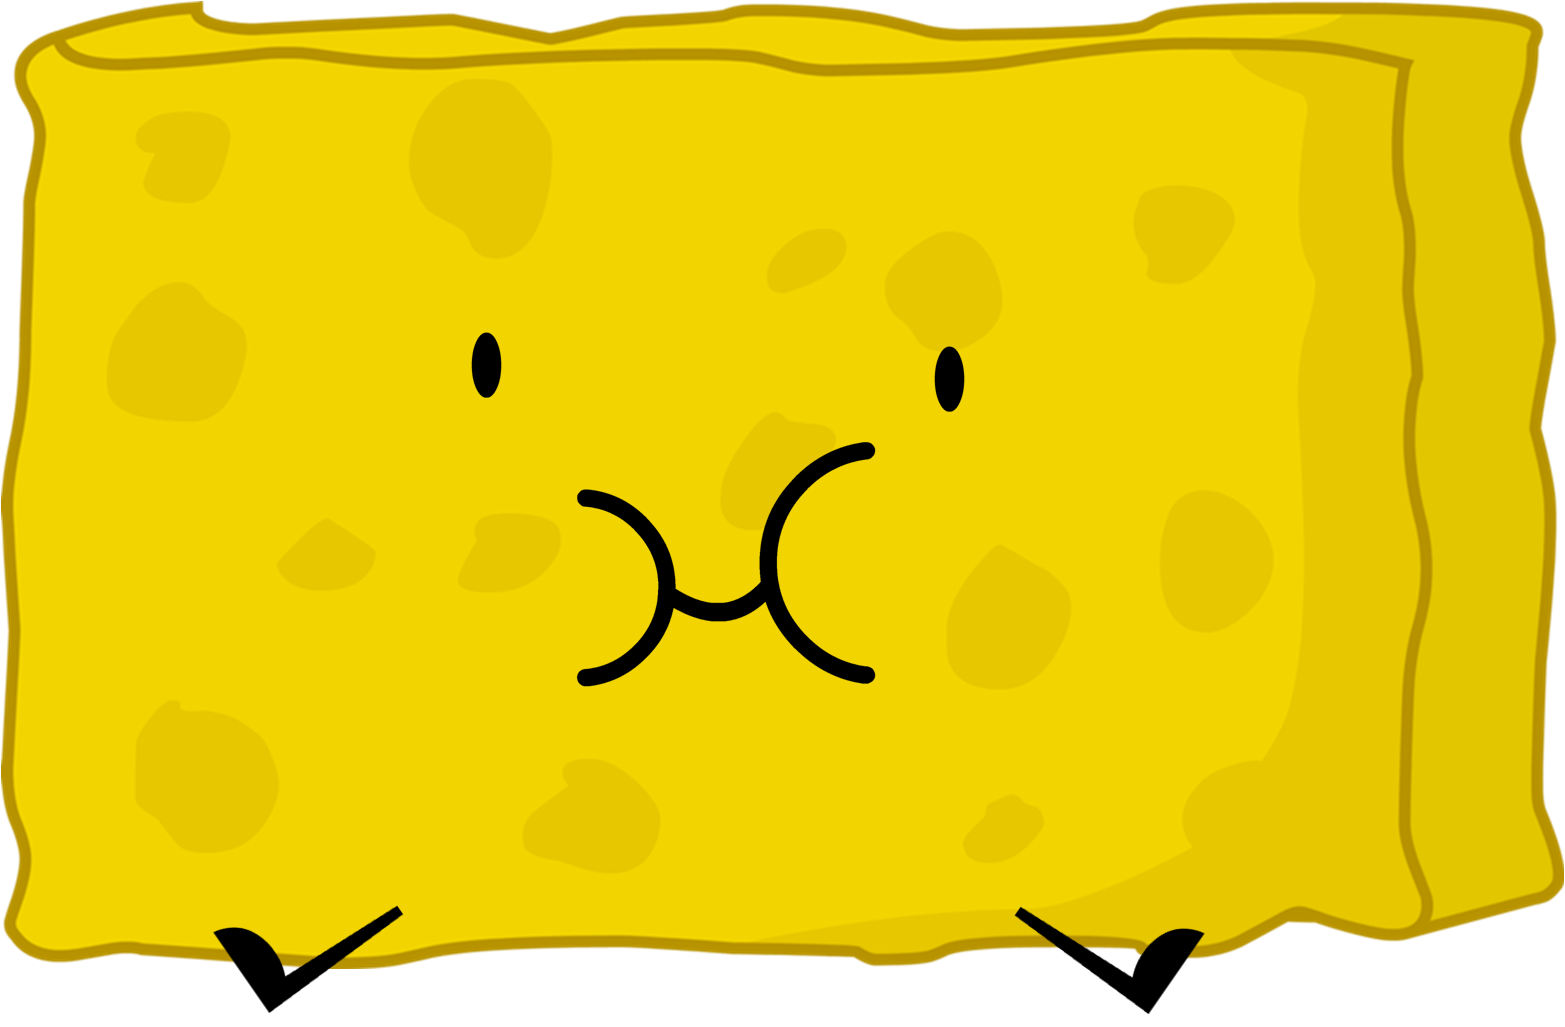 Image spongy png spongebob. Eraser clipart yellow